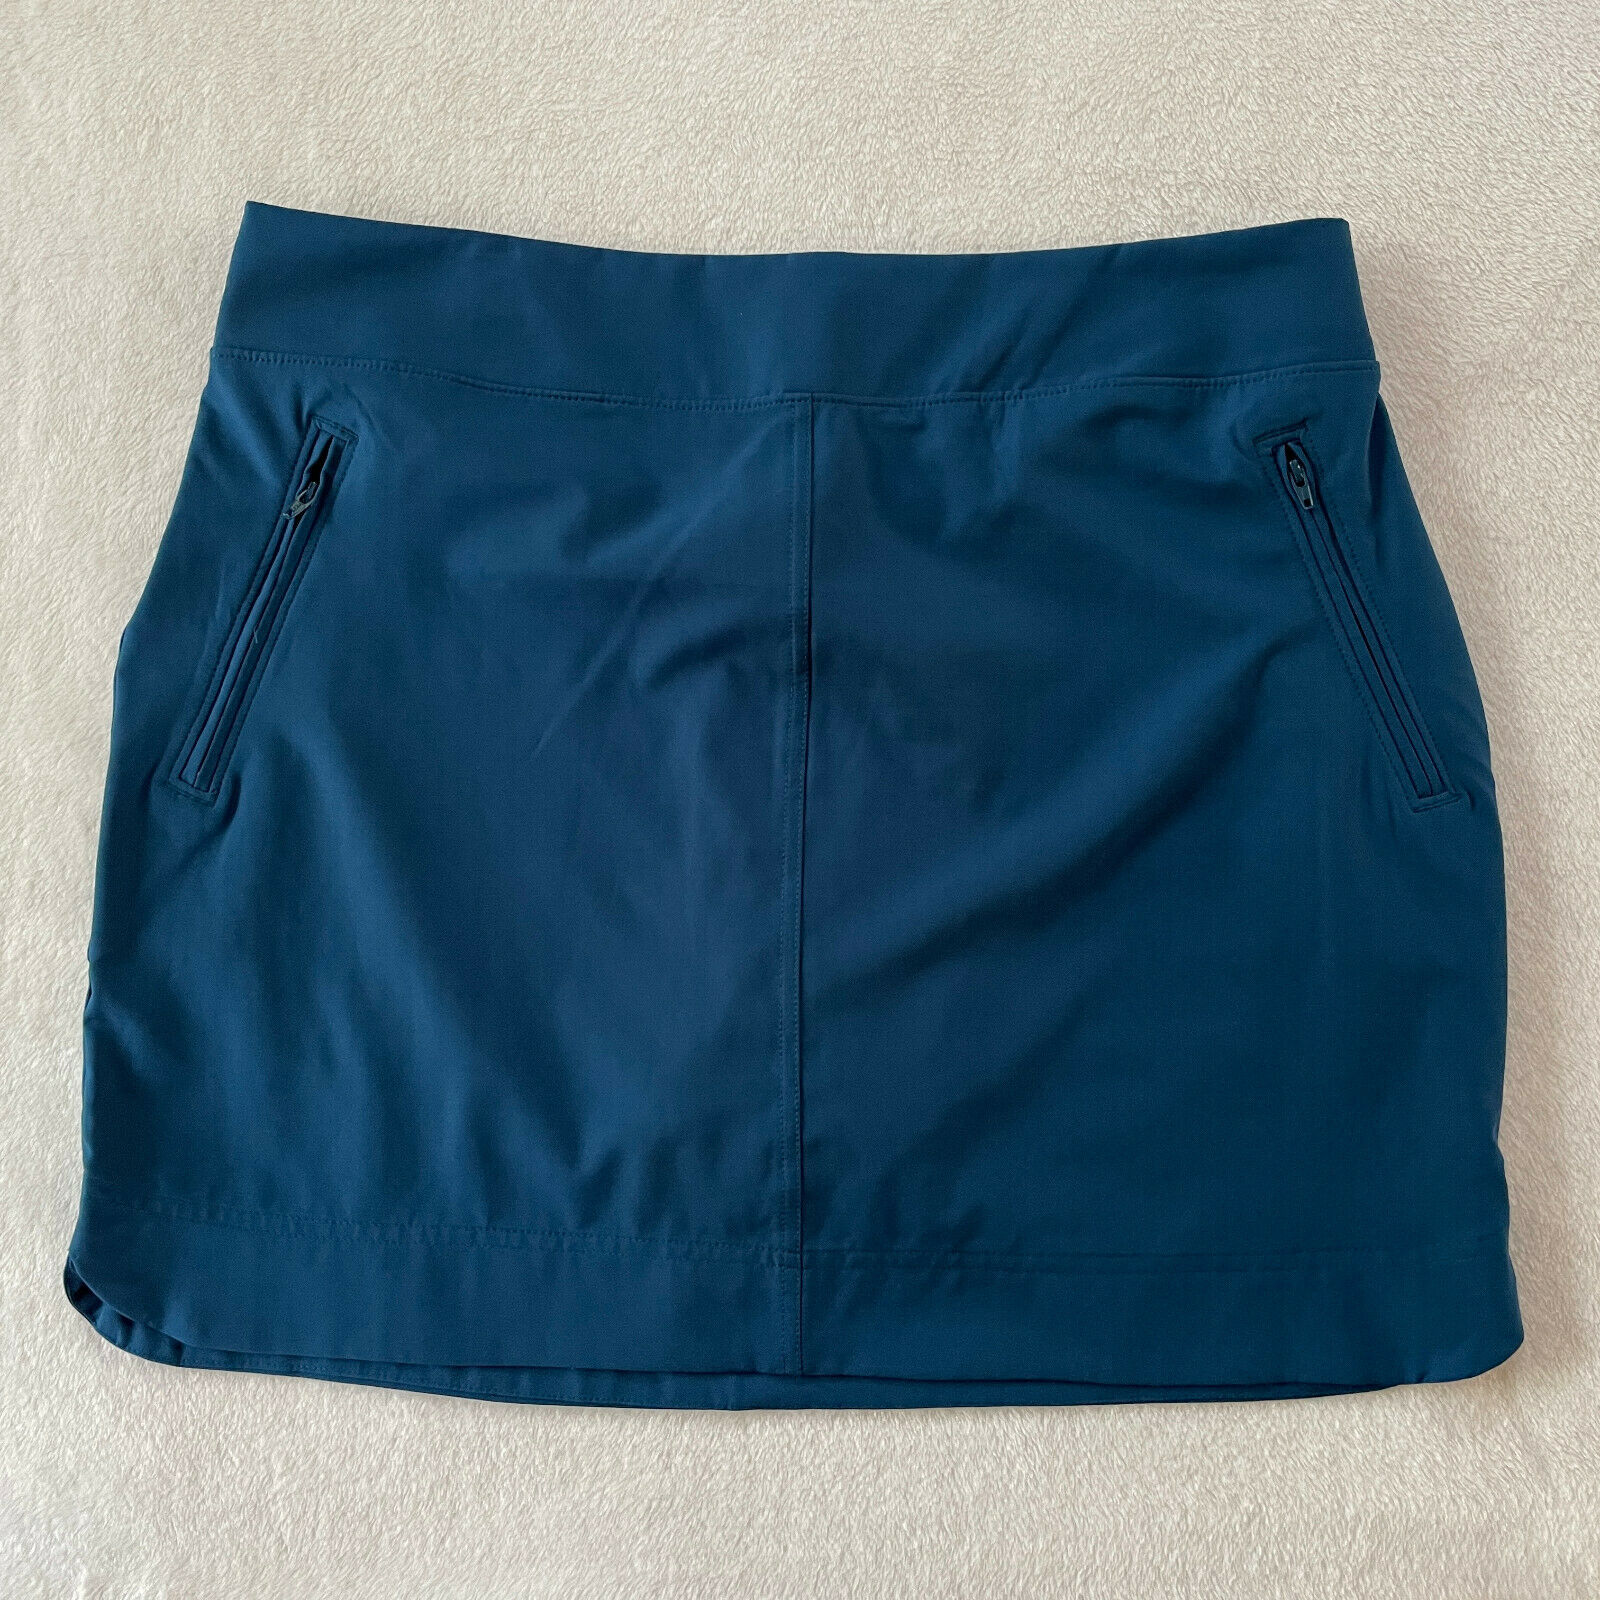 Orvis Travel Skort Skirt Womens Large L Blue Pockets Stretch Active Lightweight